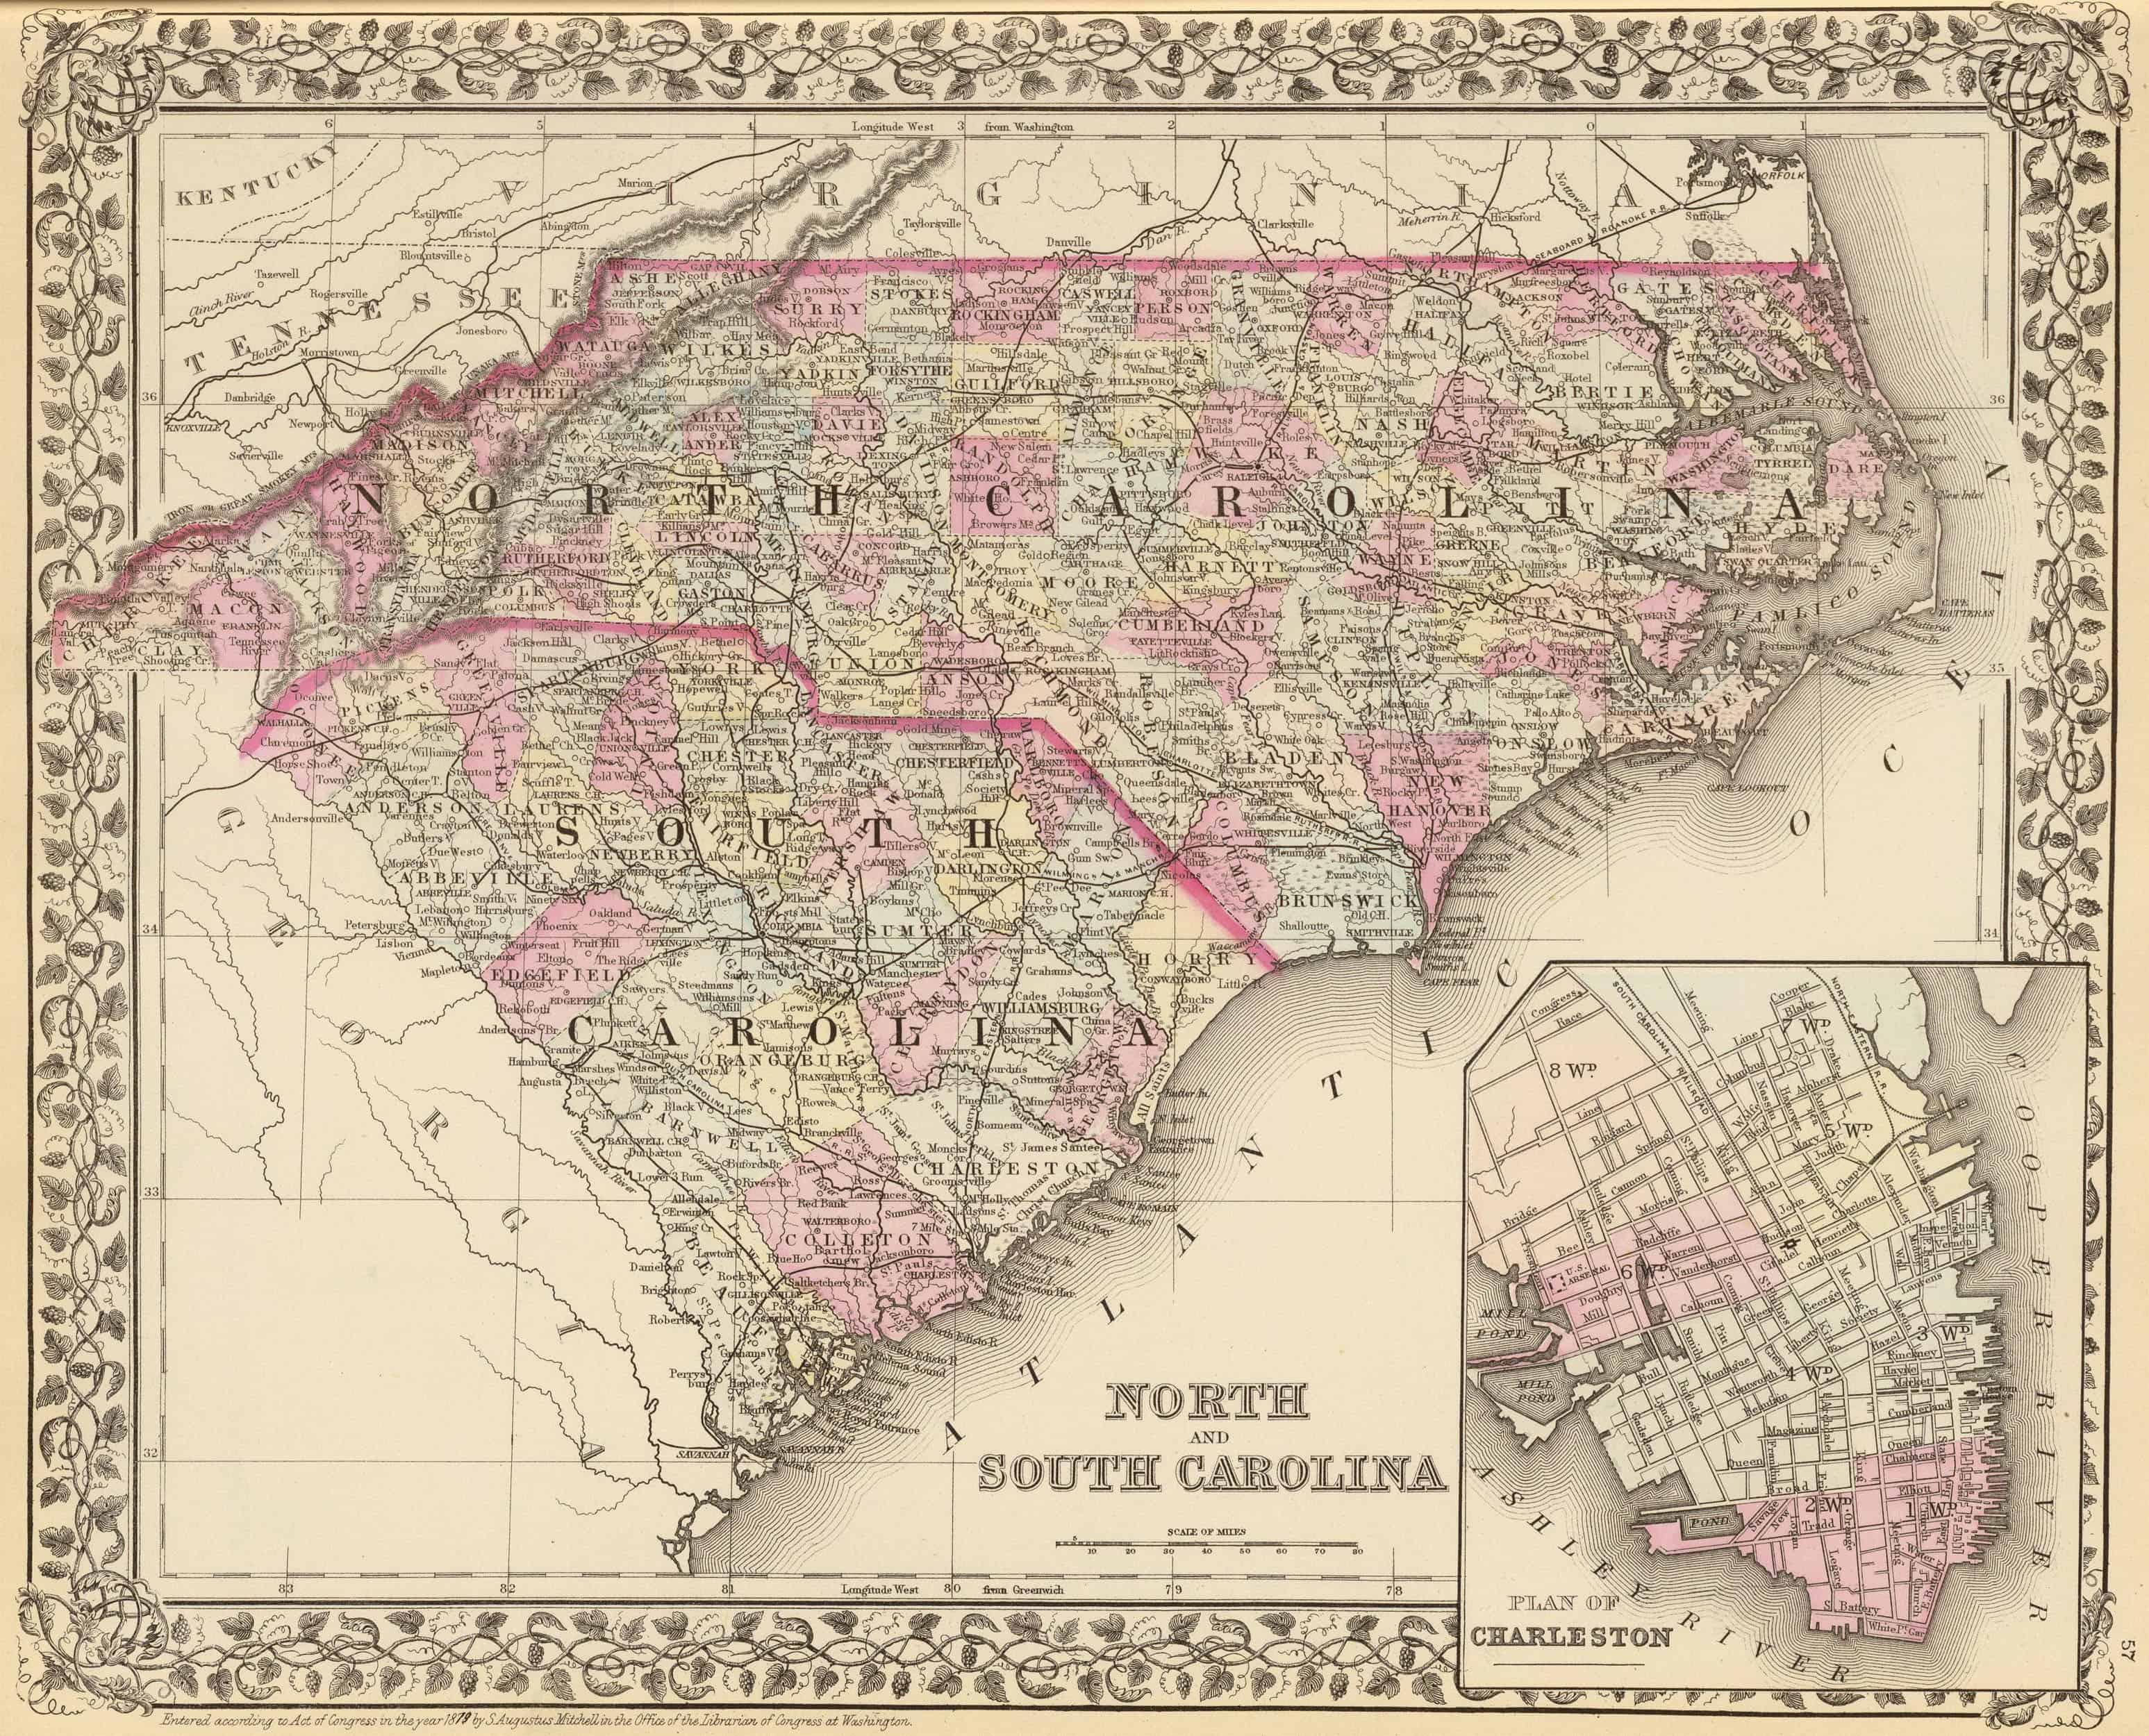 Old Historical City, County and State Maps of North Carolina on cherokee county north carolina road map, outer banks north carolina road map, clemmons north carolina road map,